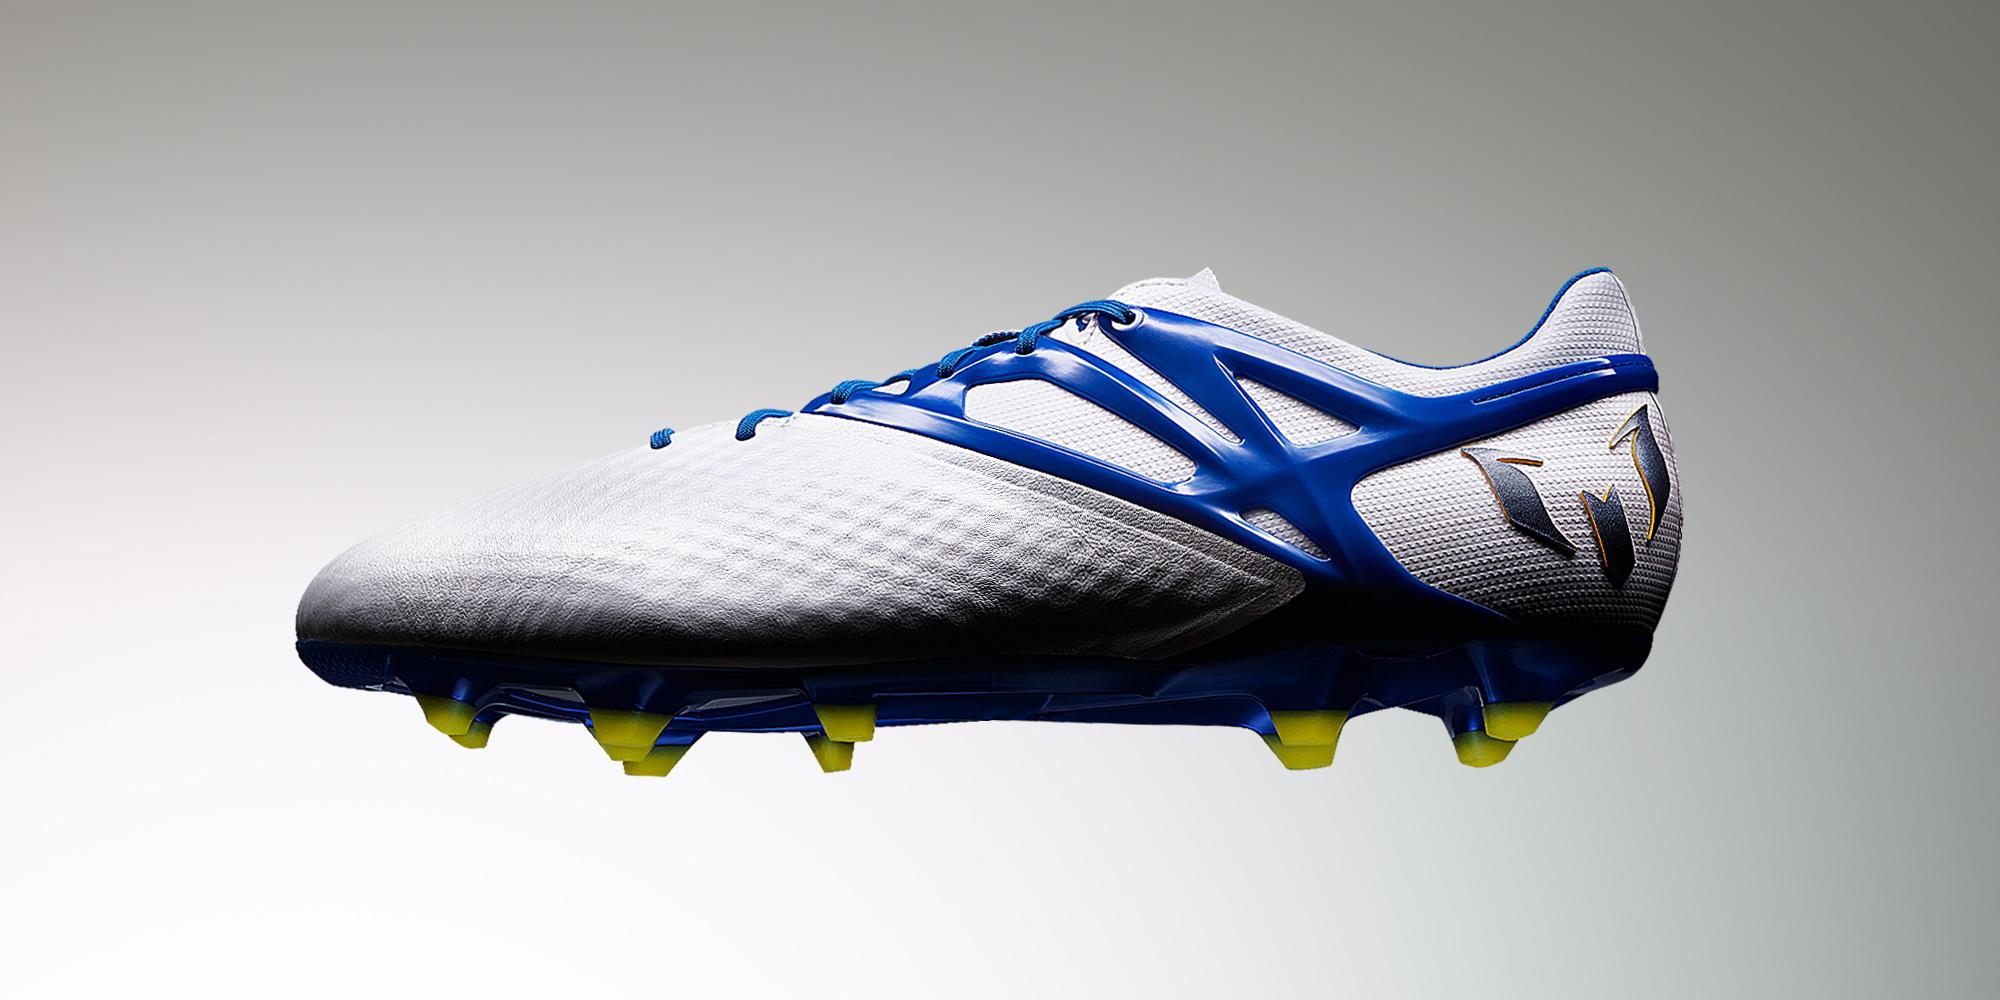 hvide-og-blaa-Adidas-Messi15-02-fodboldfreak